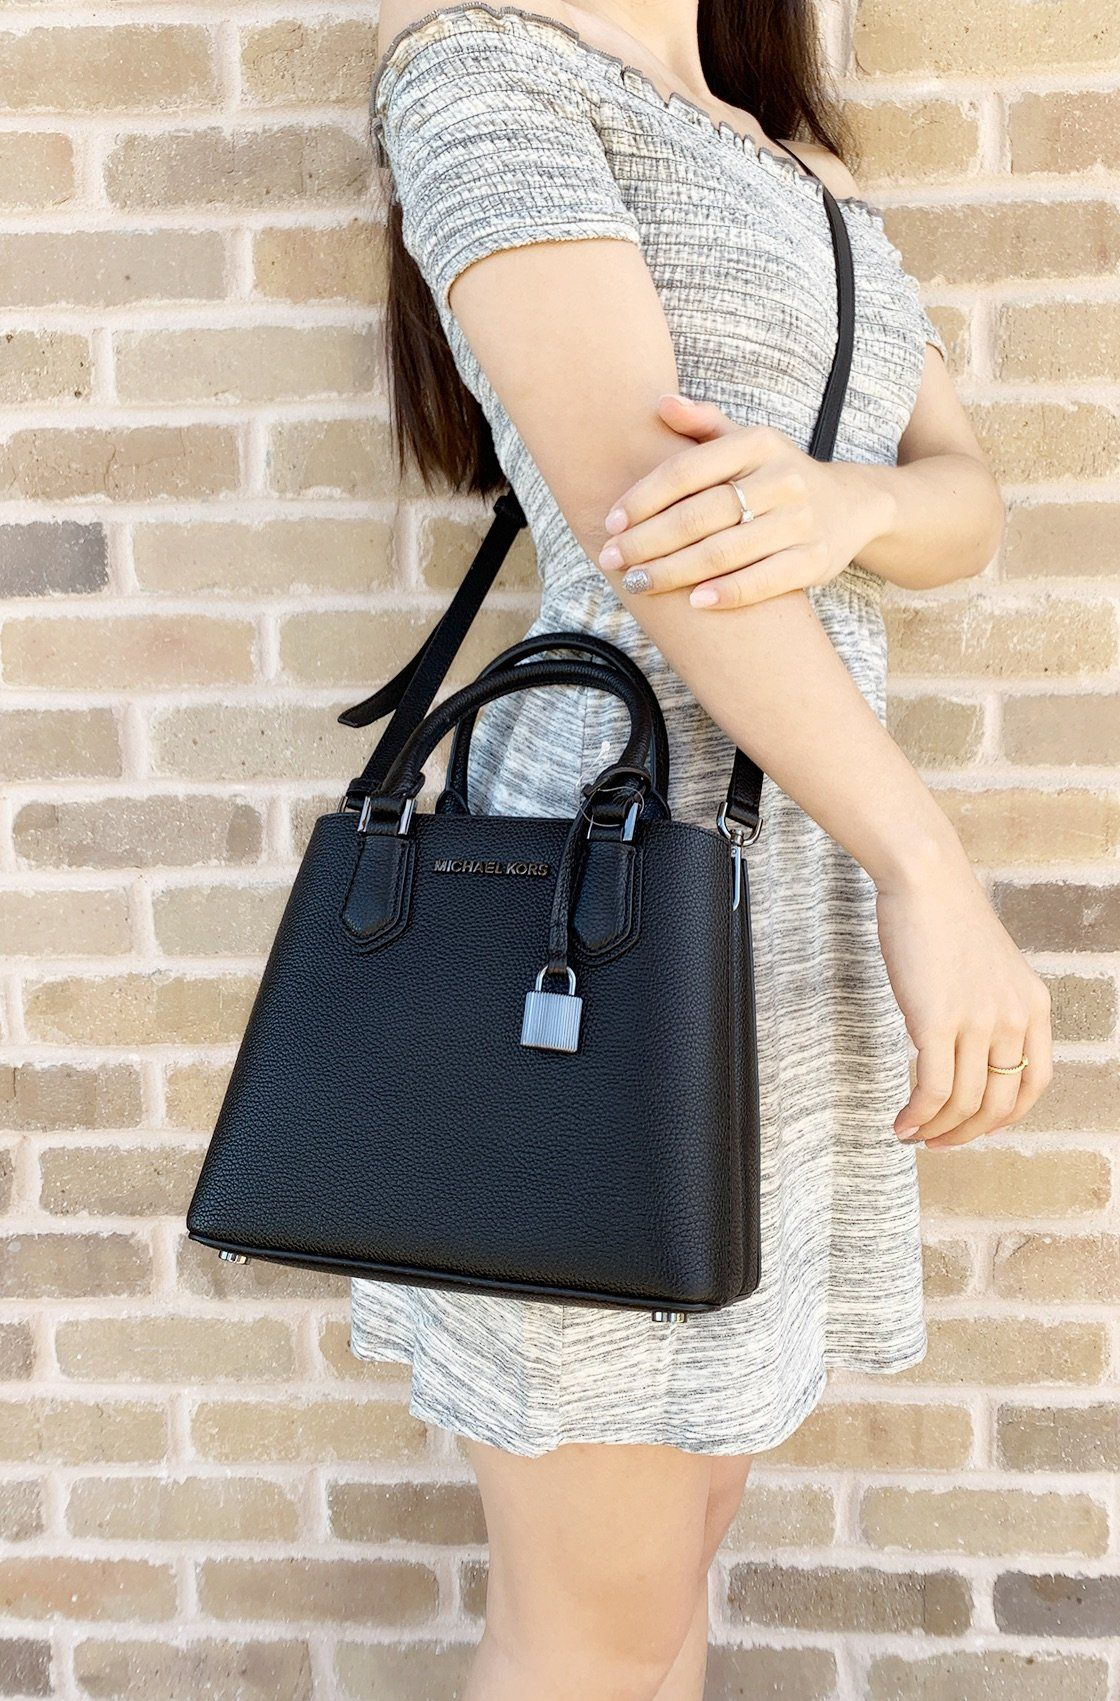 b7ca33c03b2f Michael Kors Adele Mercer Medium Messenger Bag Black Gunmetal #ebayreseller  #MichaelKors #poshcloset #mercaricode #Handbags #poshfind #ebayresellers ...